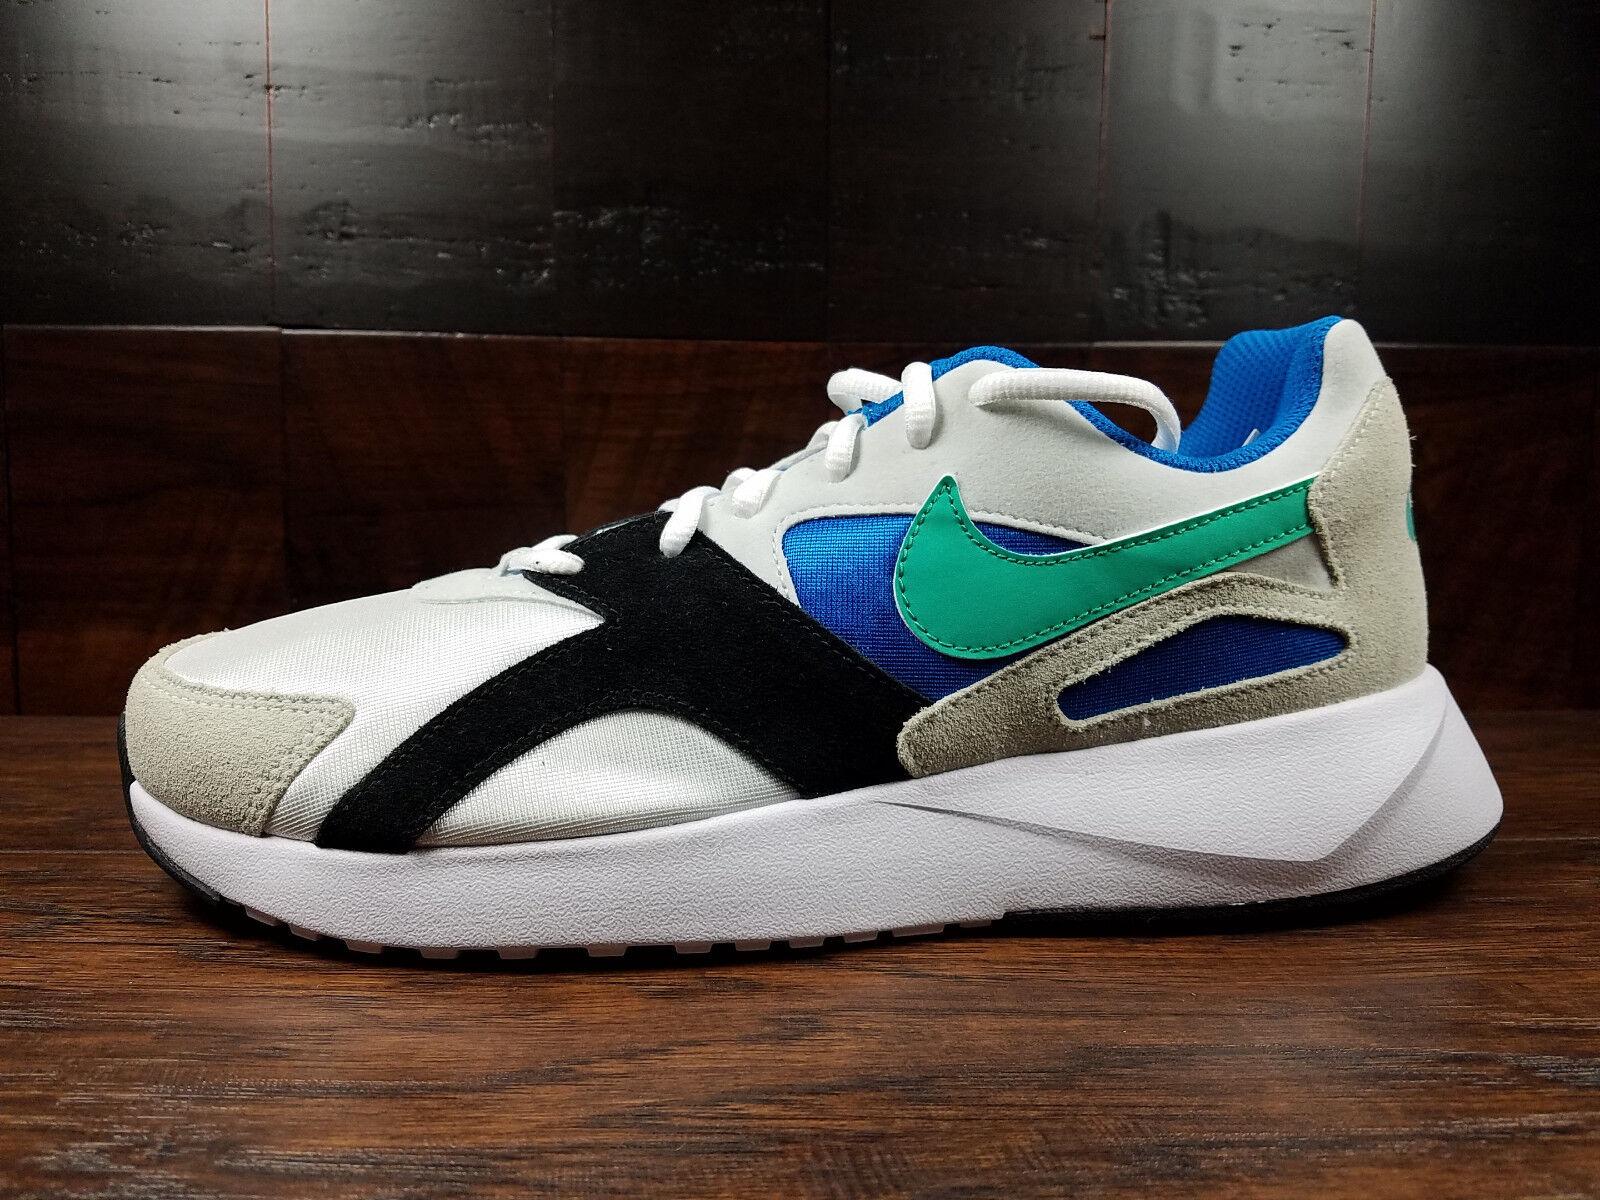 Nike Pantheos (blancoo Kinetic verde Azul) Retro  Nsw Para Hombre 8-11